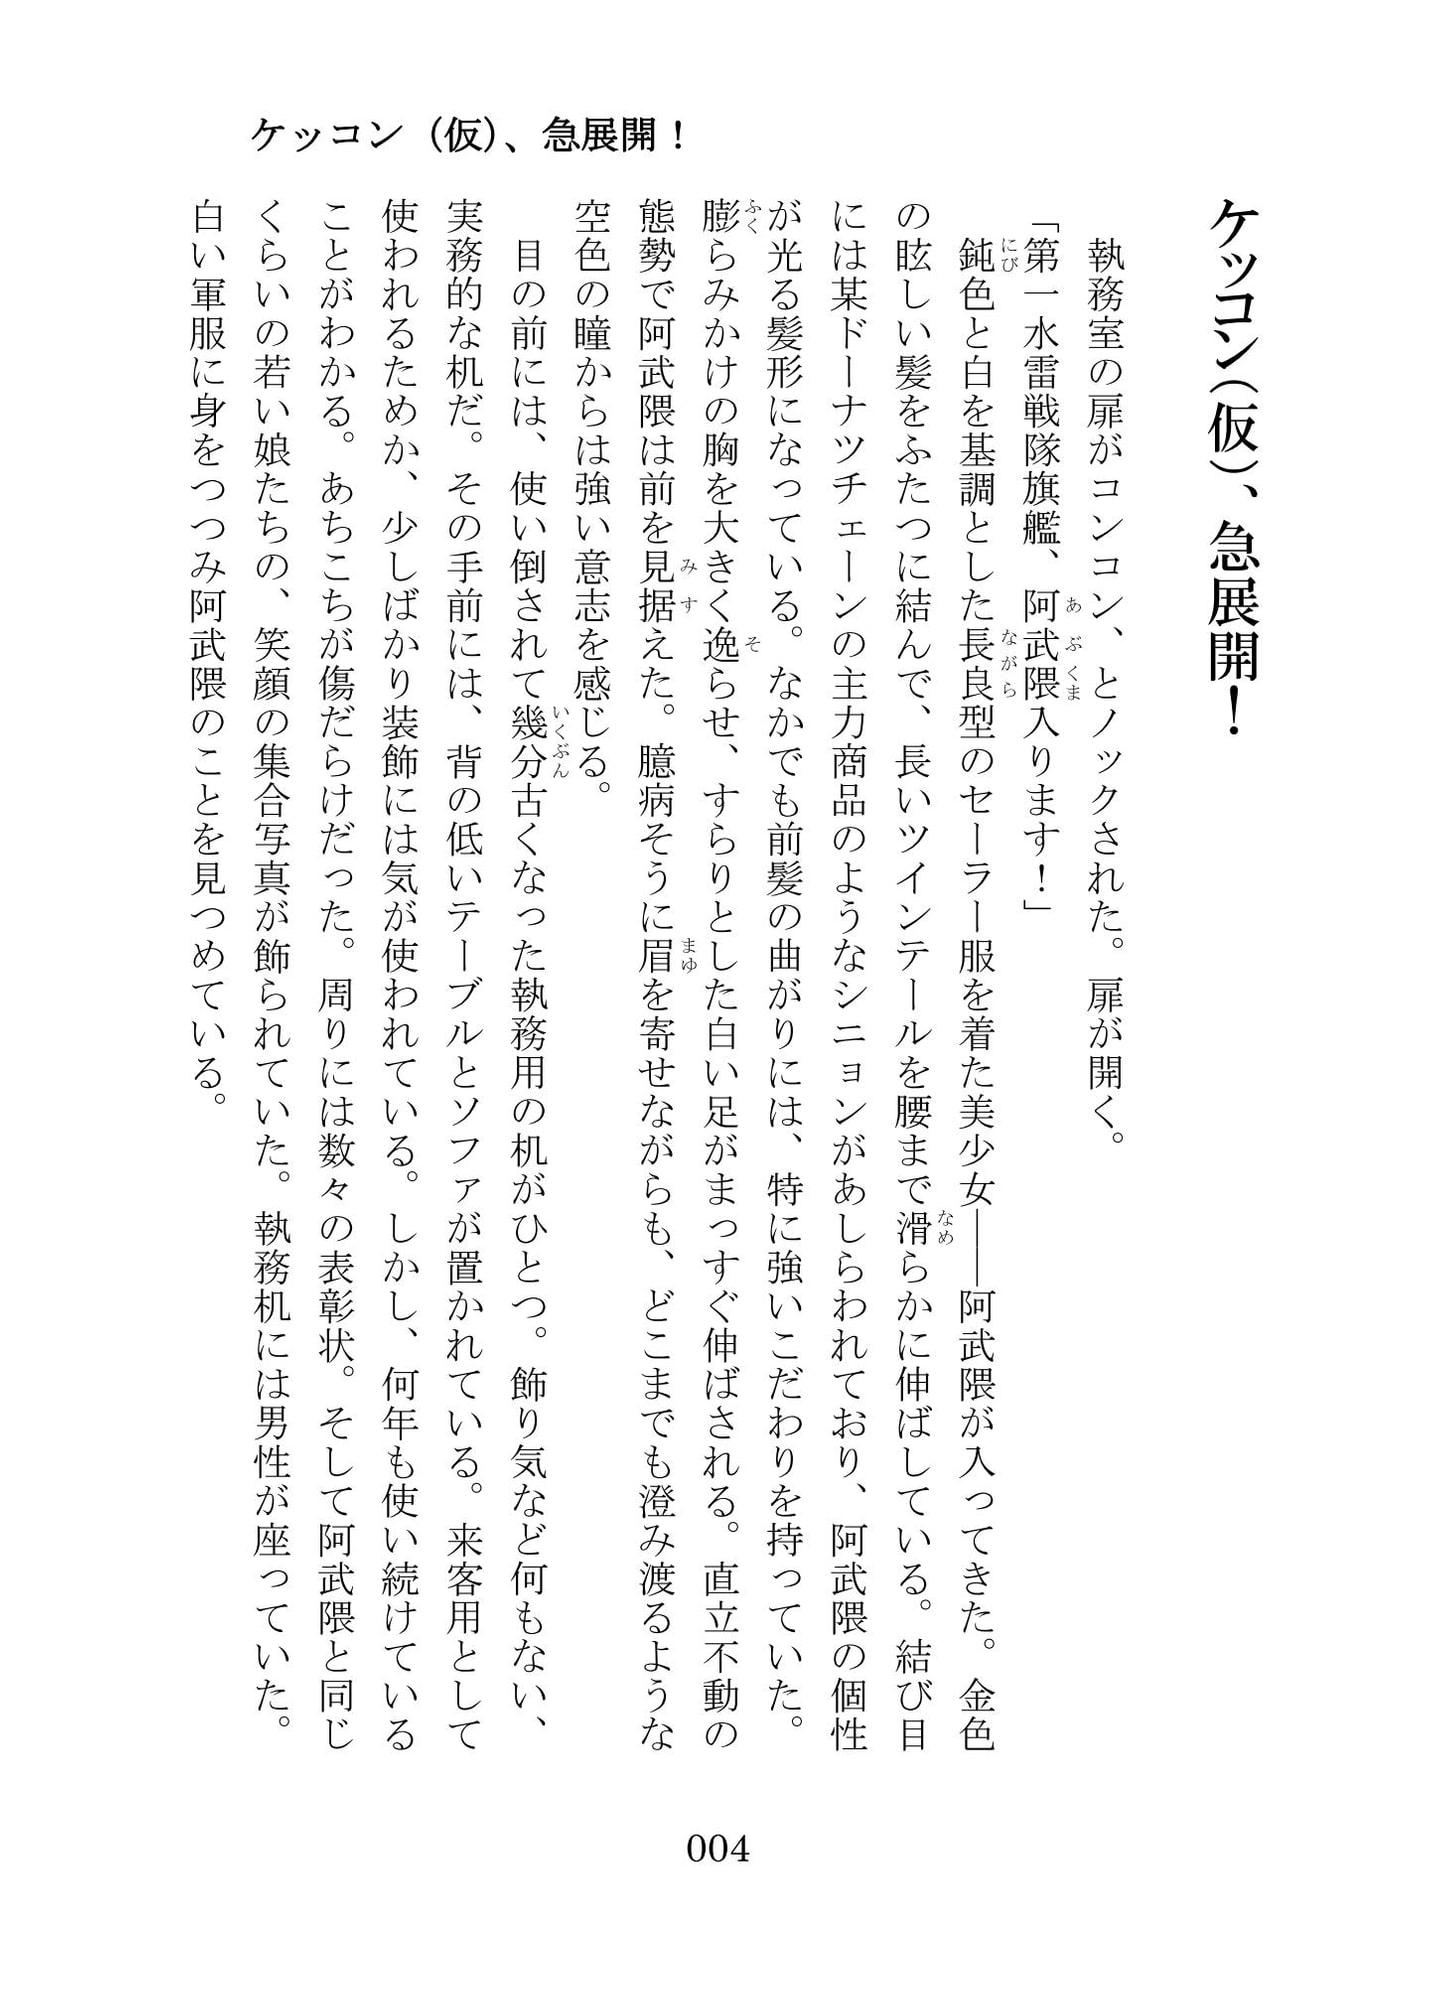 DLsite専売艦隊こらぷしょん-艦こら-阿武隈、悪堕ちします!